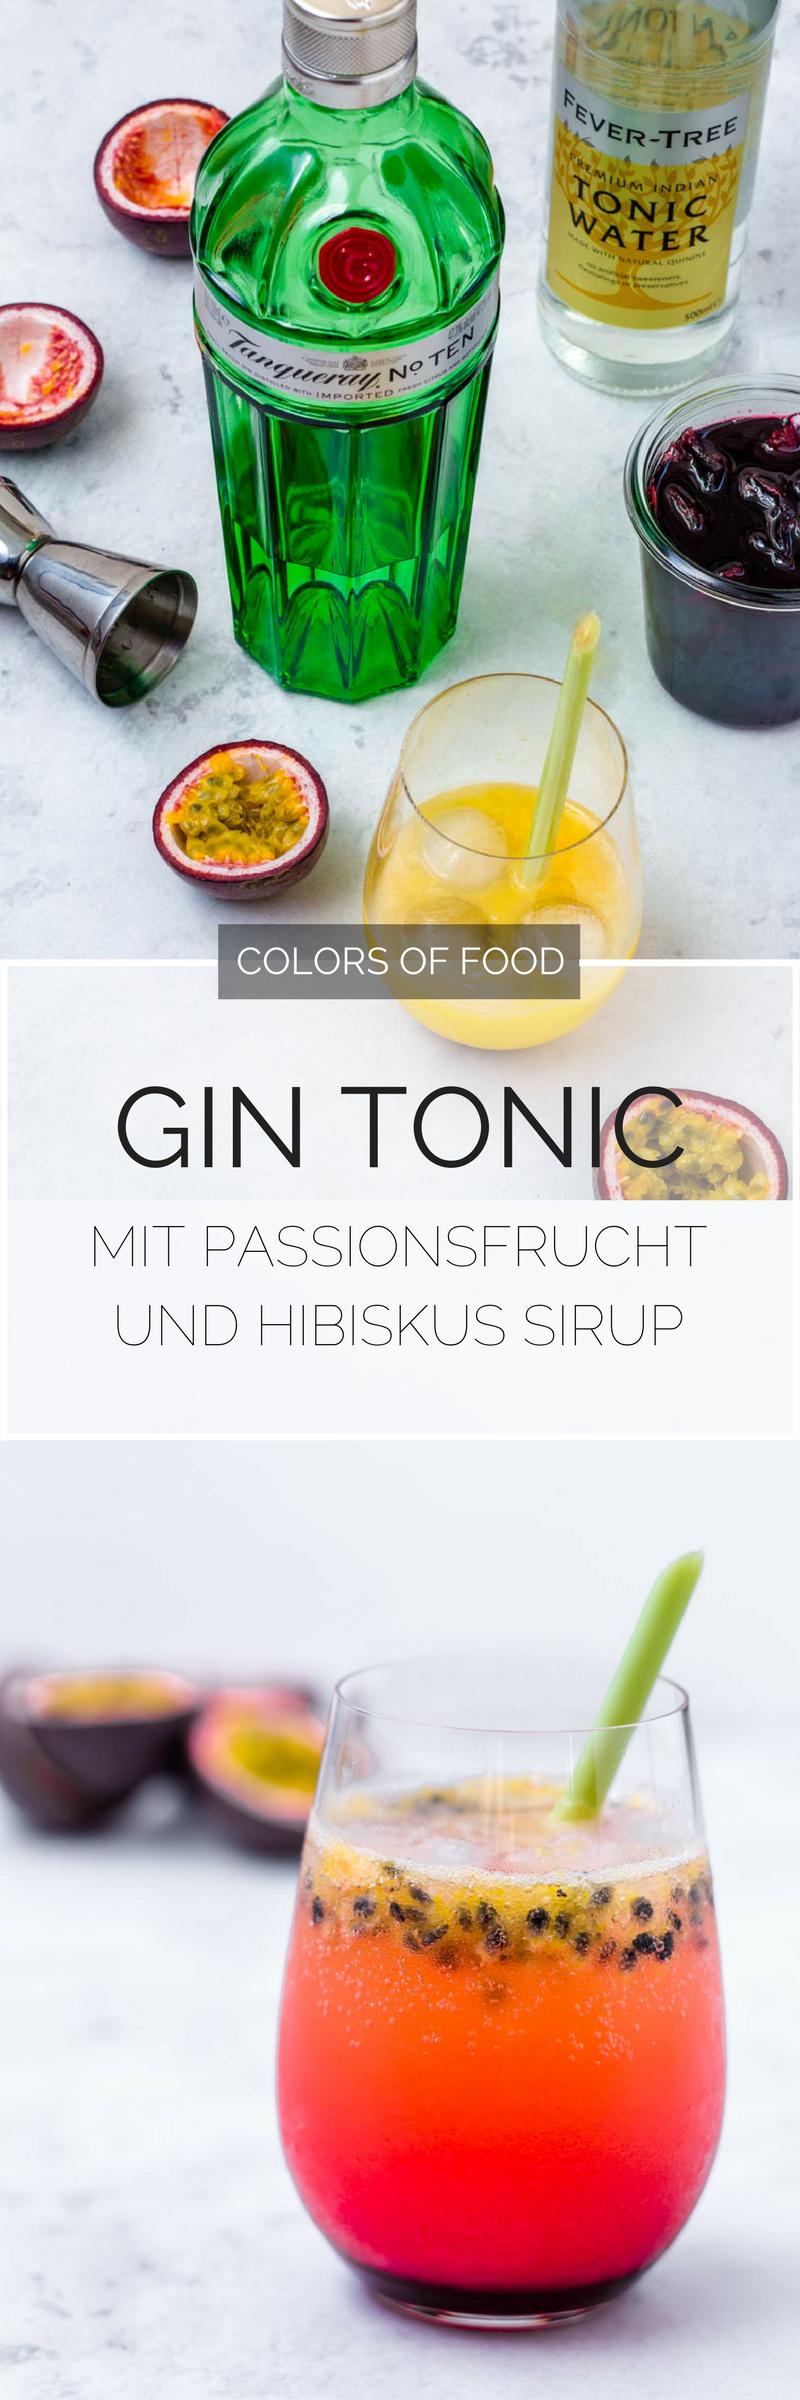 gin tonic mit passionsfrucht und hibiskus sirup recipe. Black Bedroom Furniture Sets. Home Design Ideas